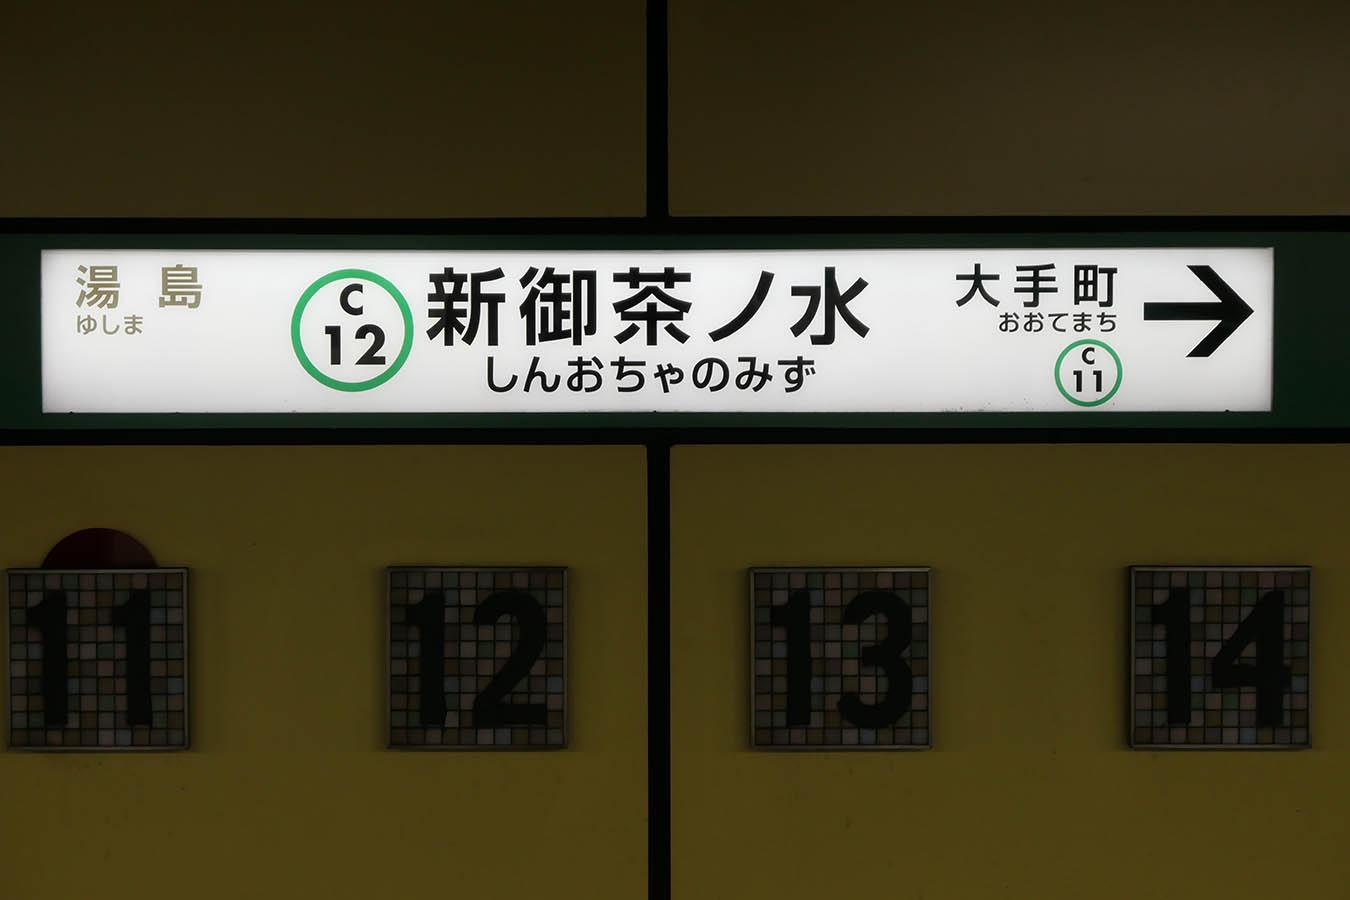 C12_photo06.jpg